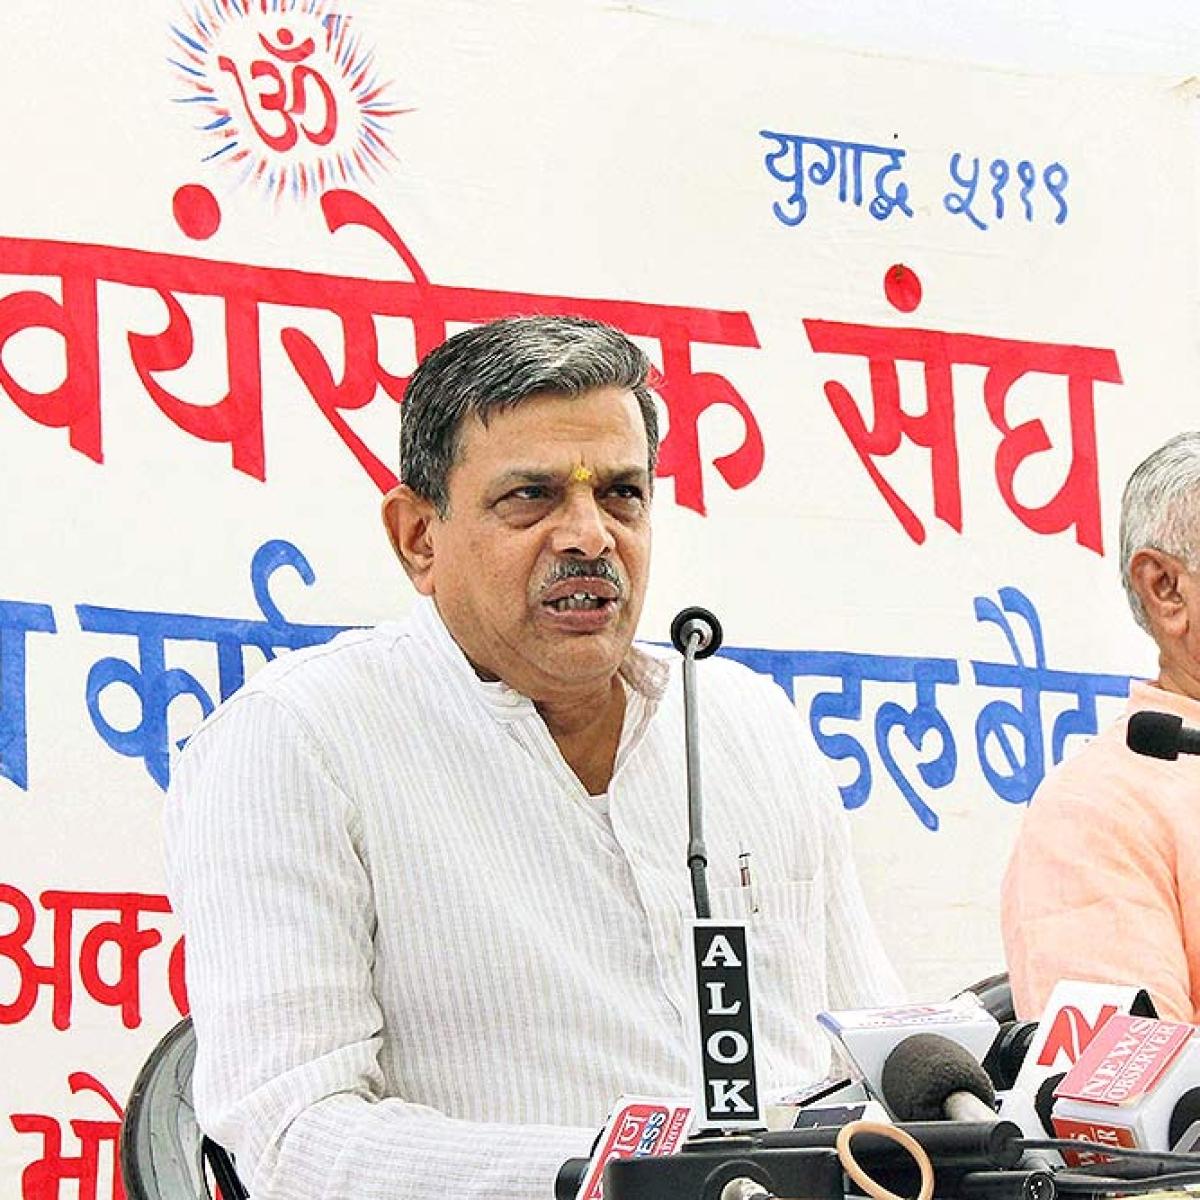 Dattatreya Hosabale elected Sarkaryavah of RSS, to replace Suresh Bhaiyyaji Joshi